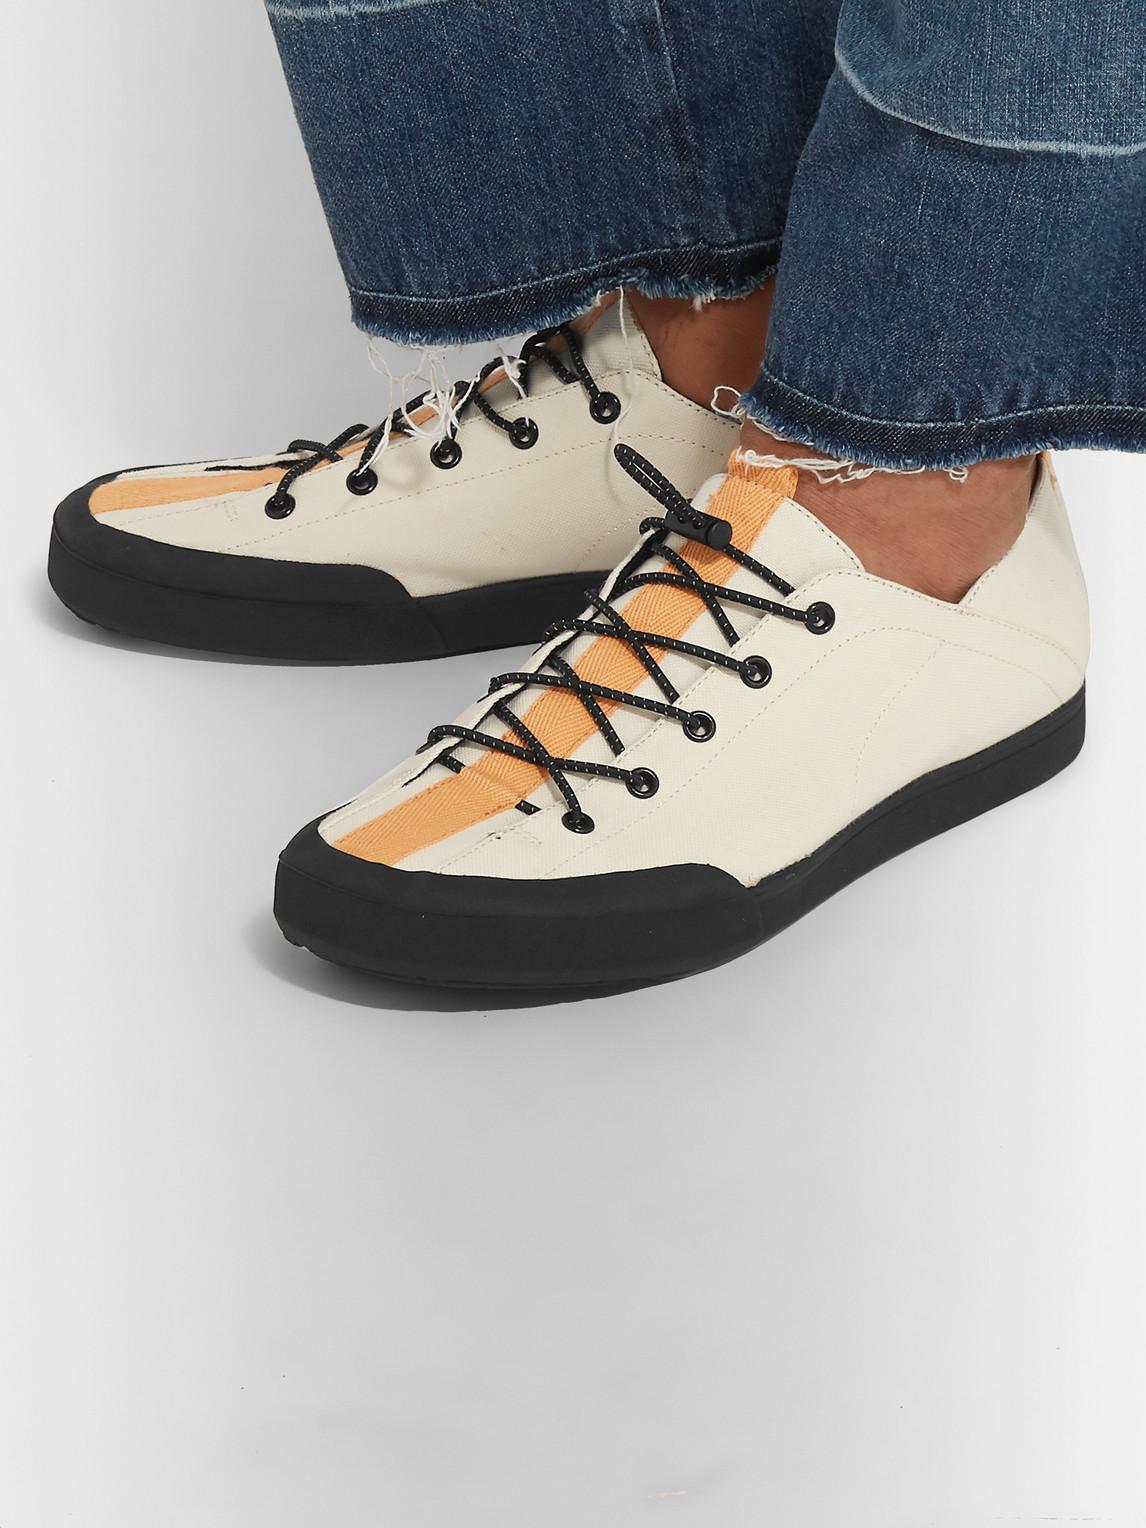 Loewe Shoes PAULA'S IBIZA LOGO